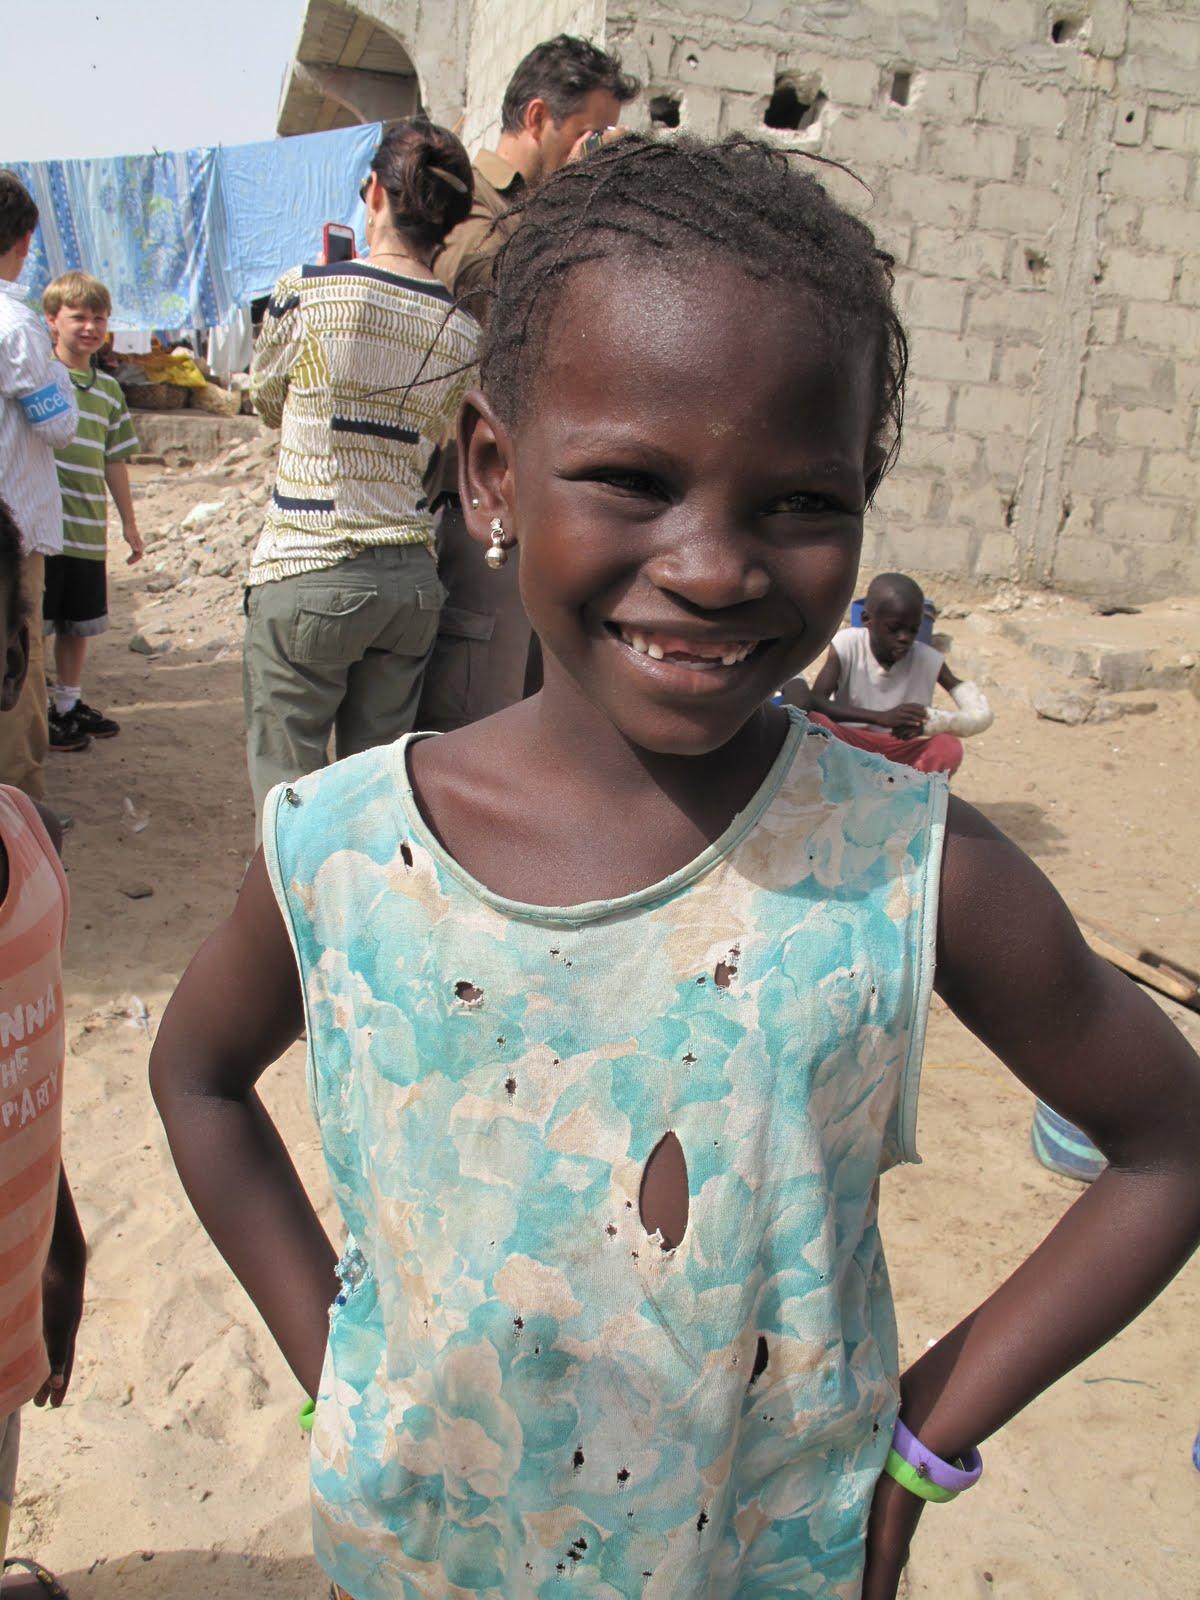 CZs Report: Children of Senegal